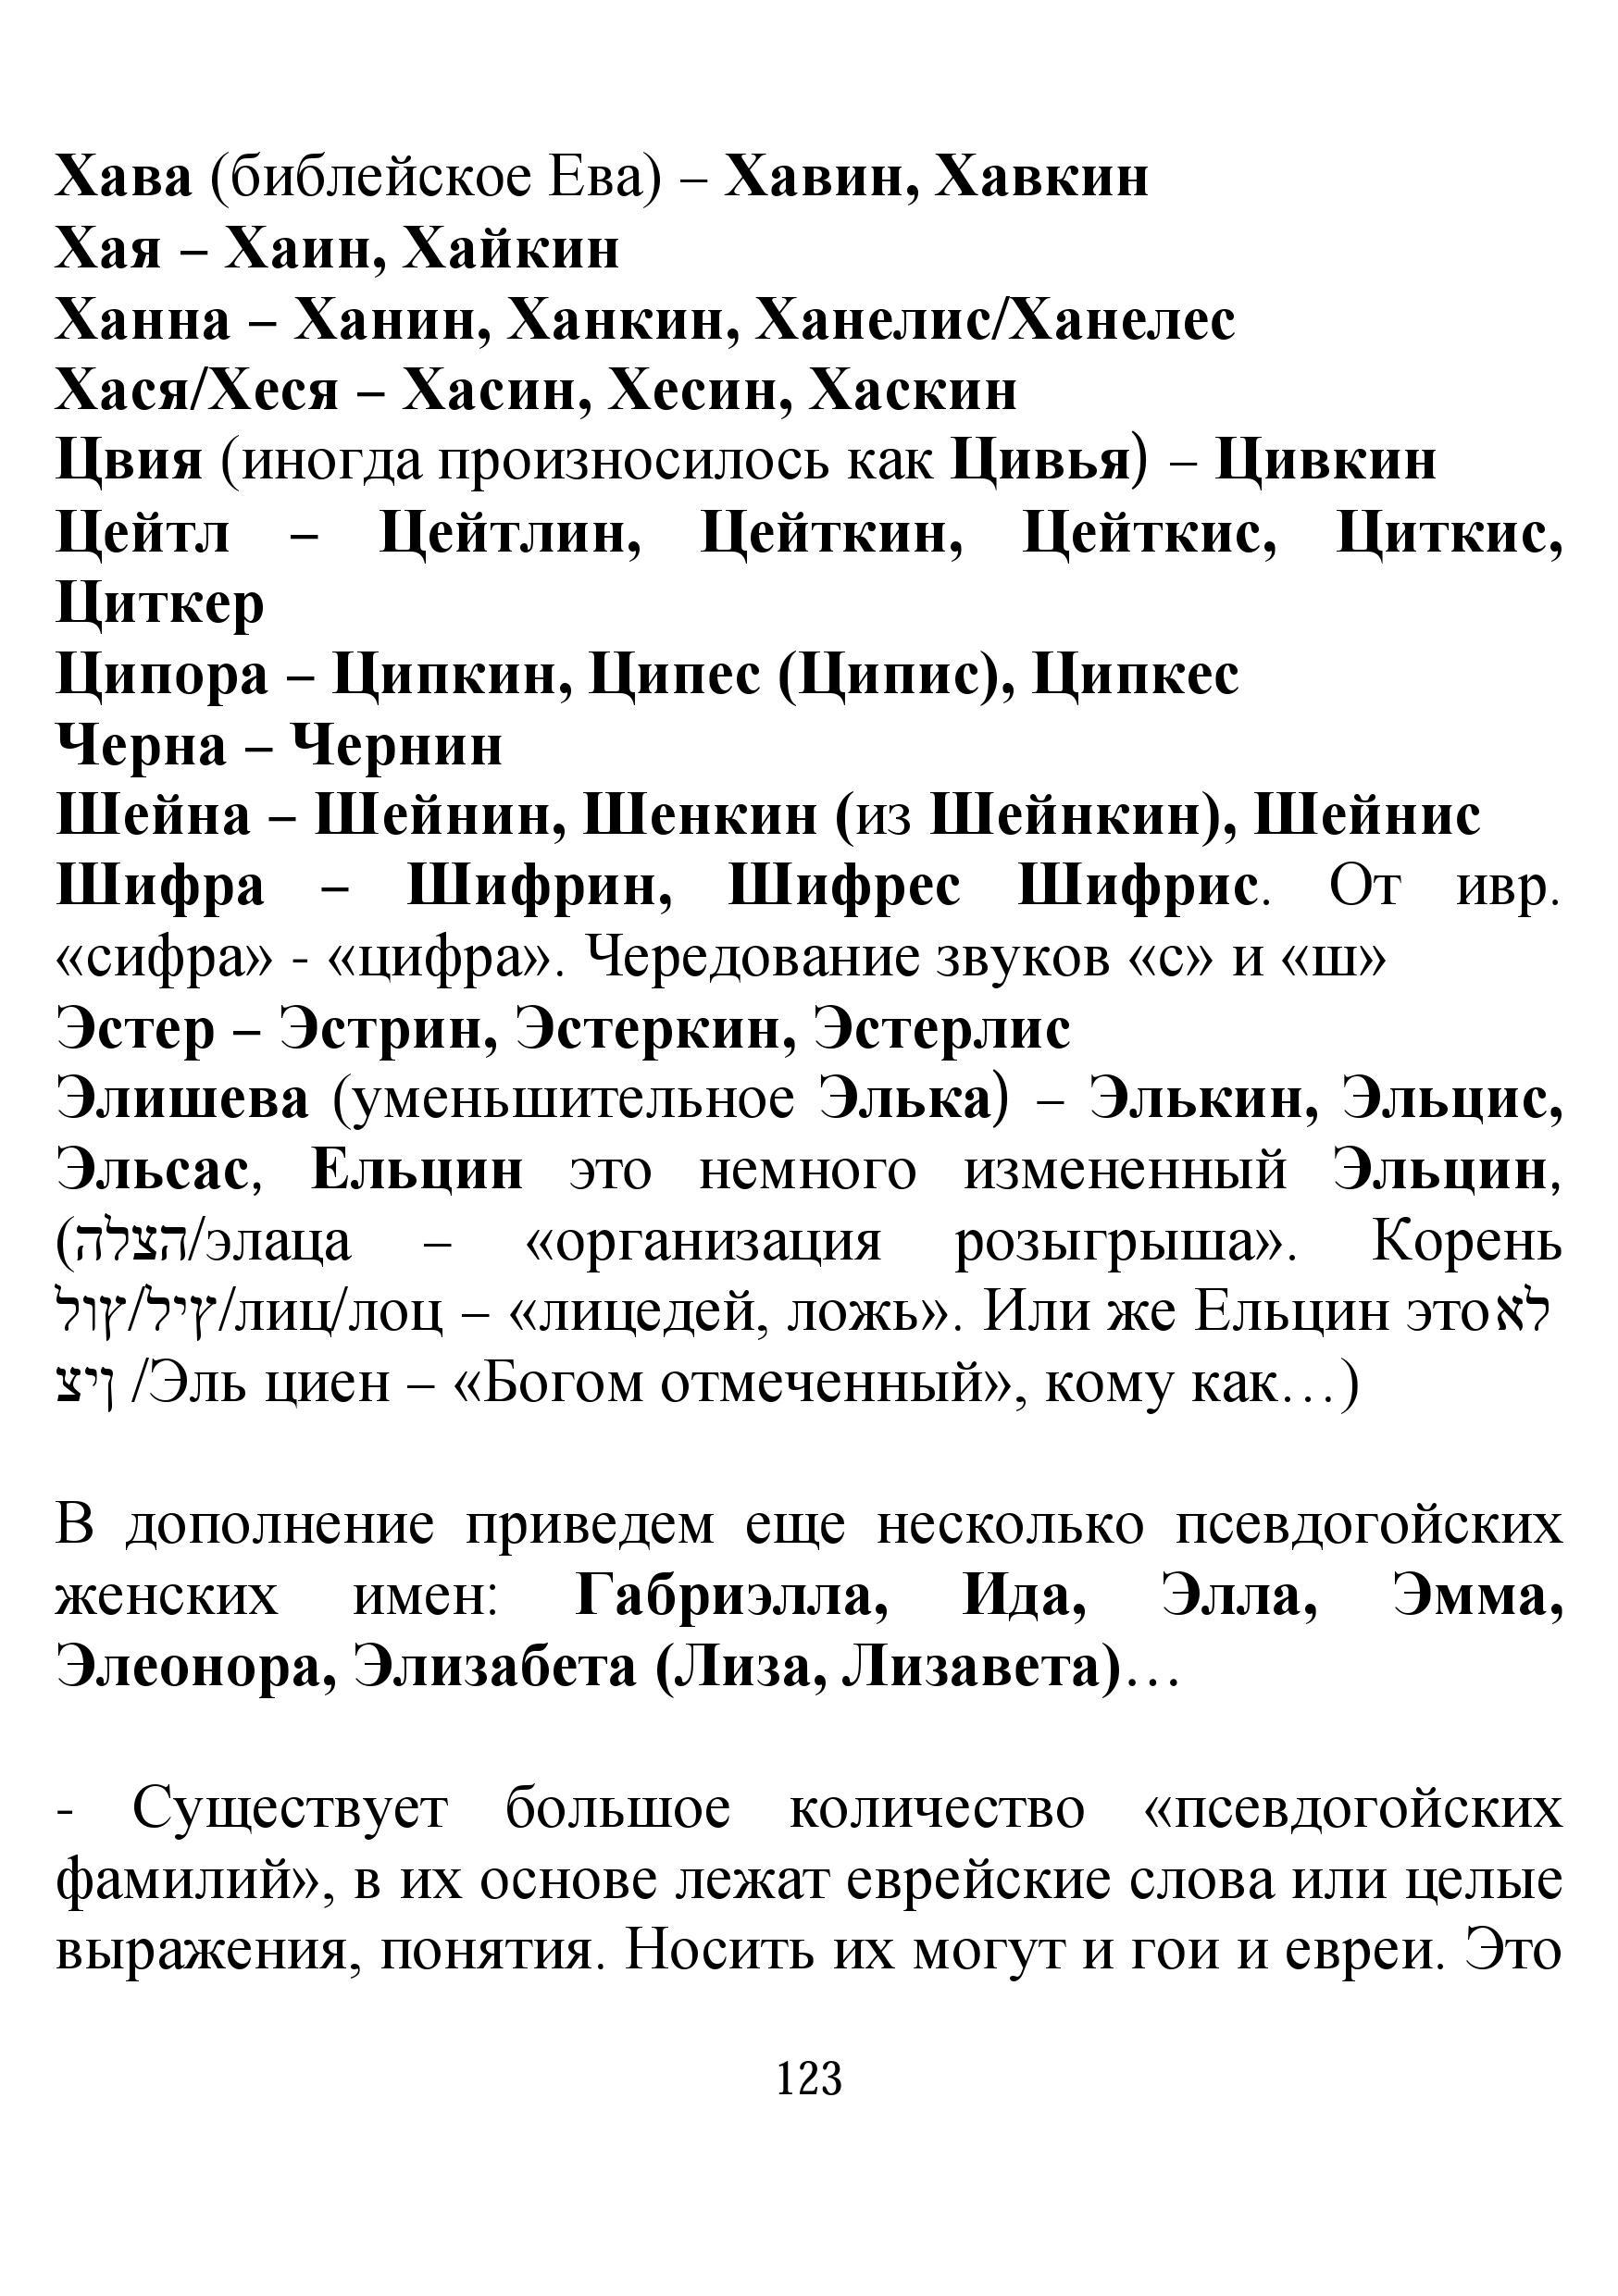 http://s4.uploads.ru/8YqiW.jpg